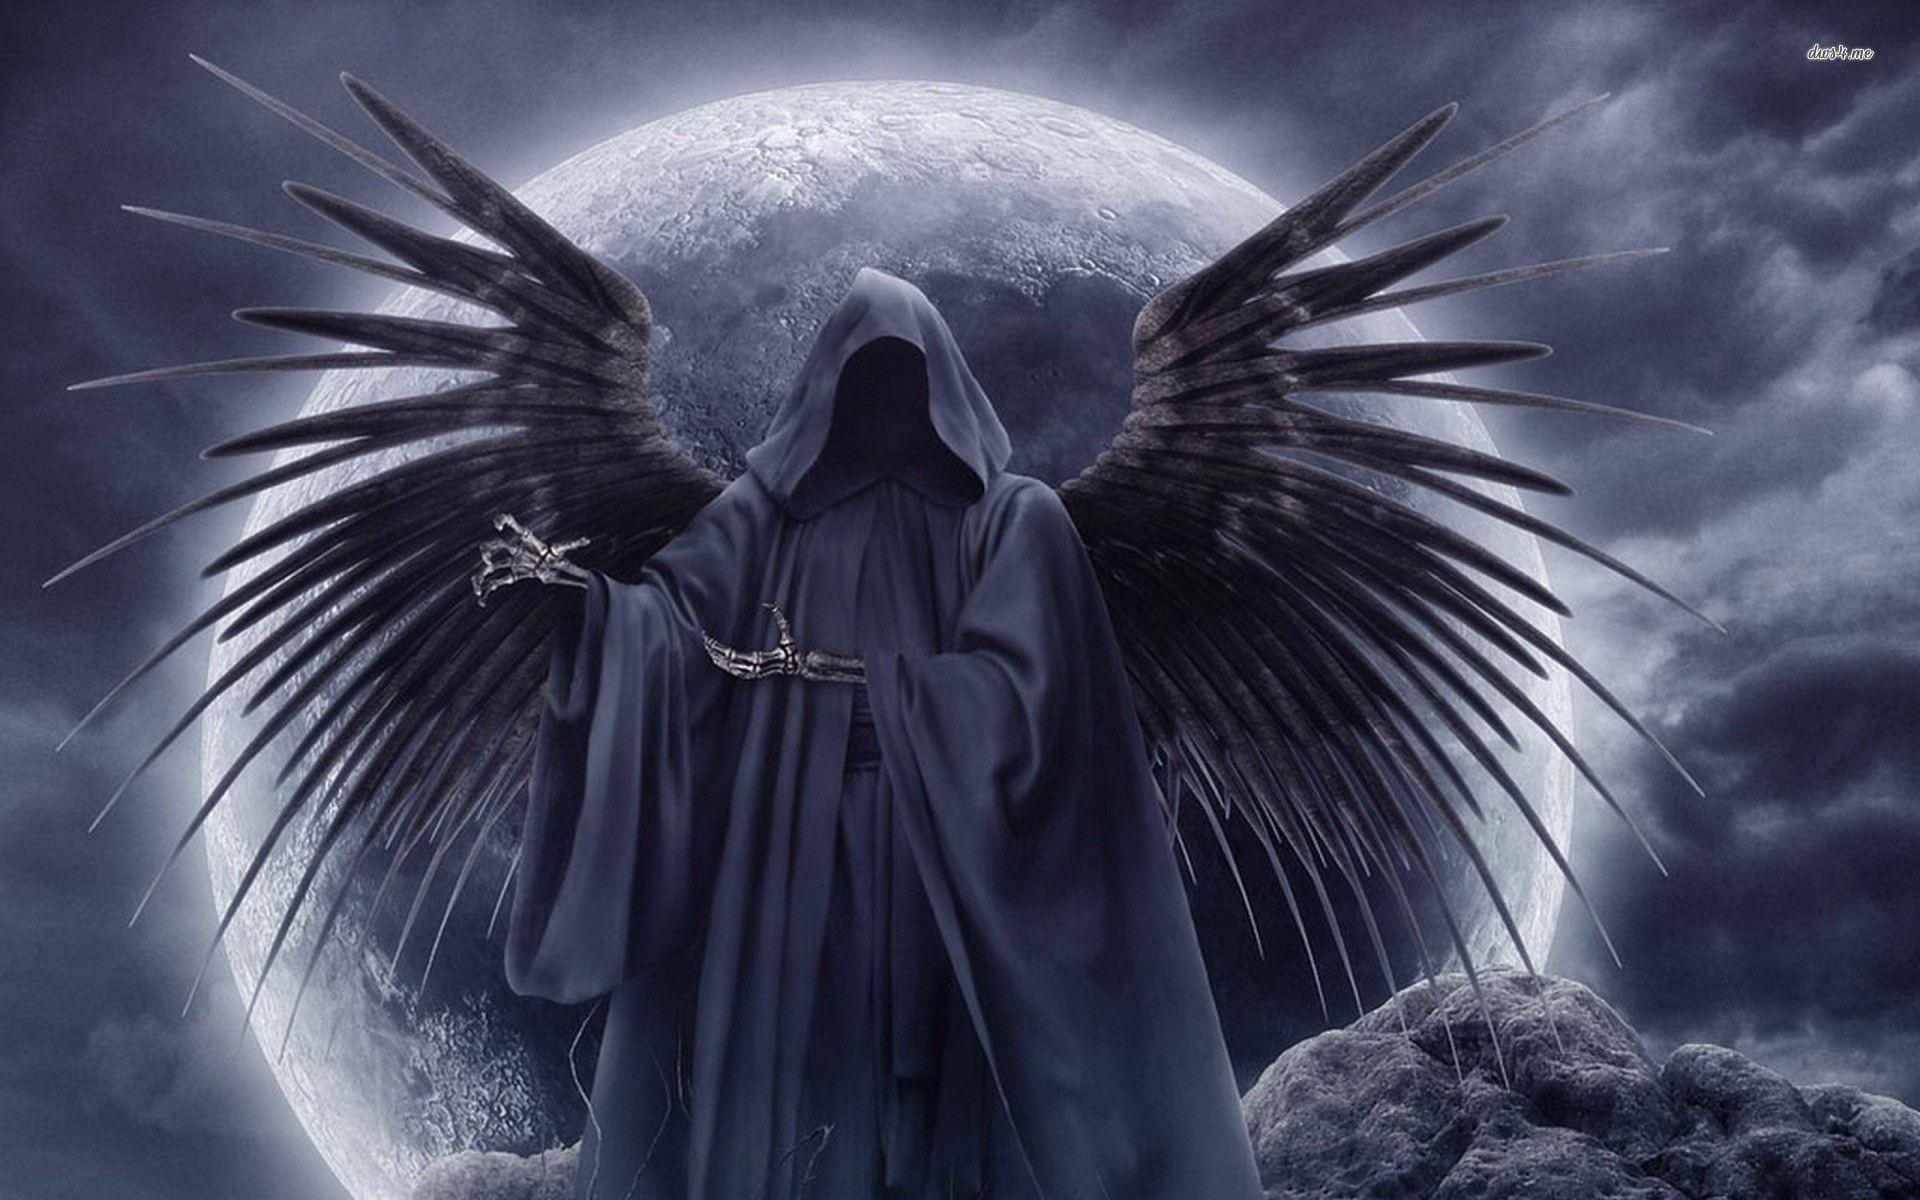 Grim Reaper Wallpapers pictures Grim reaper art, Grim